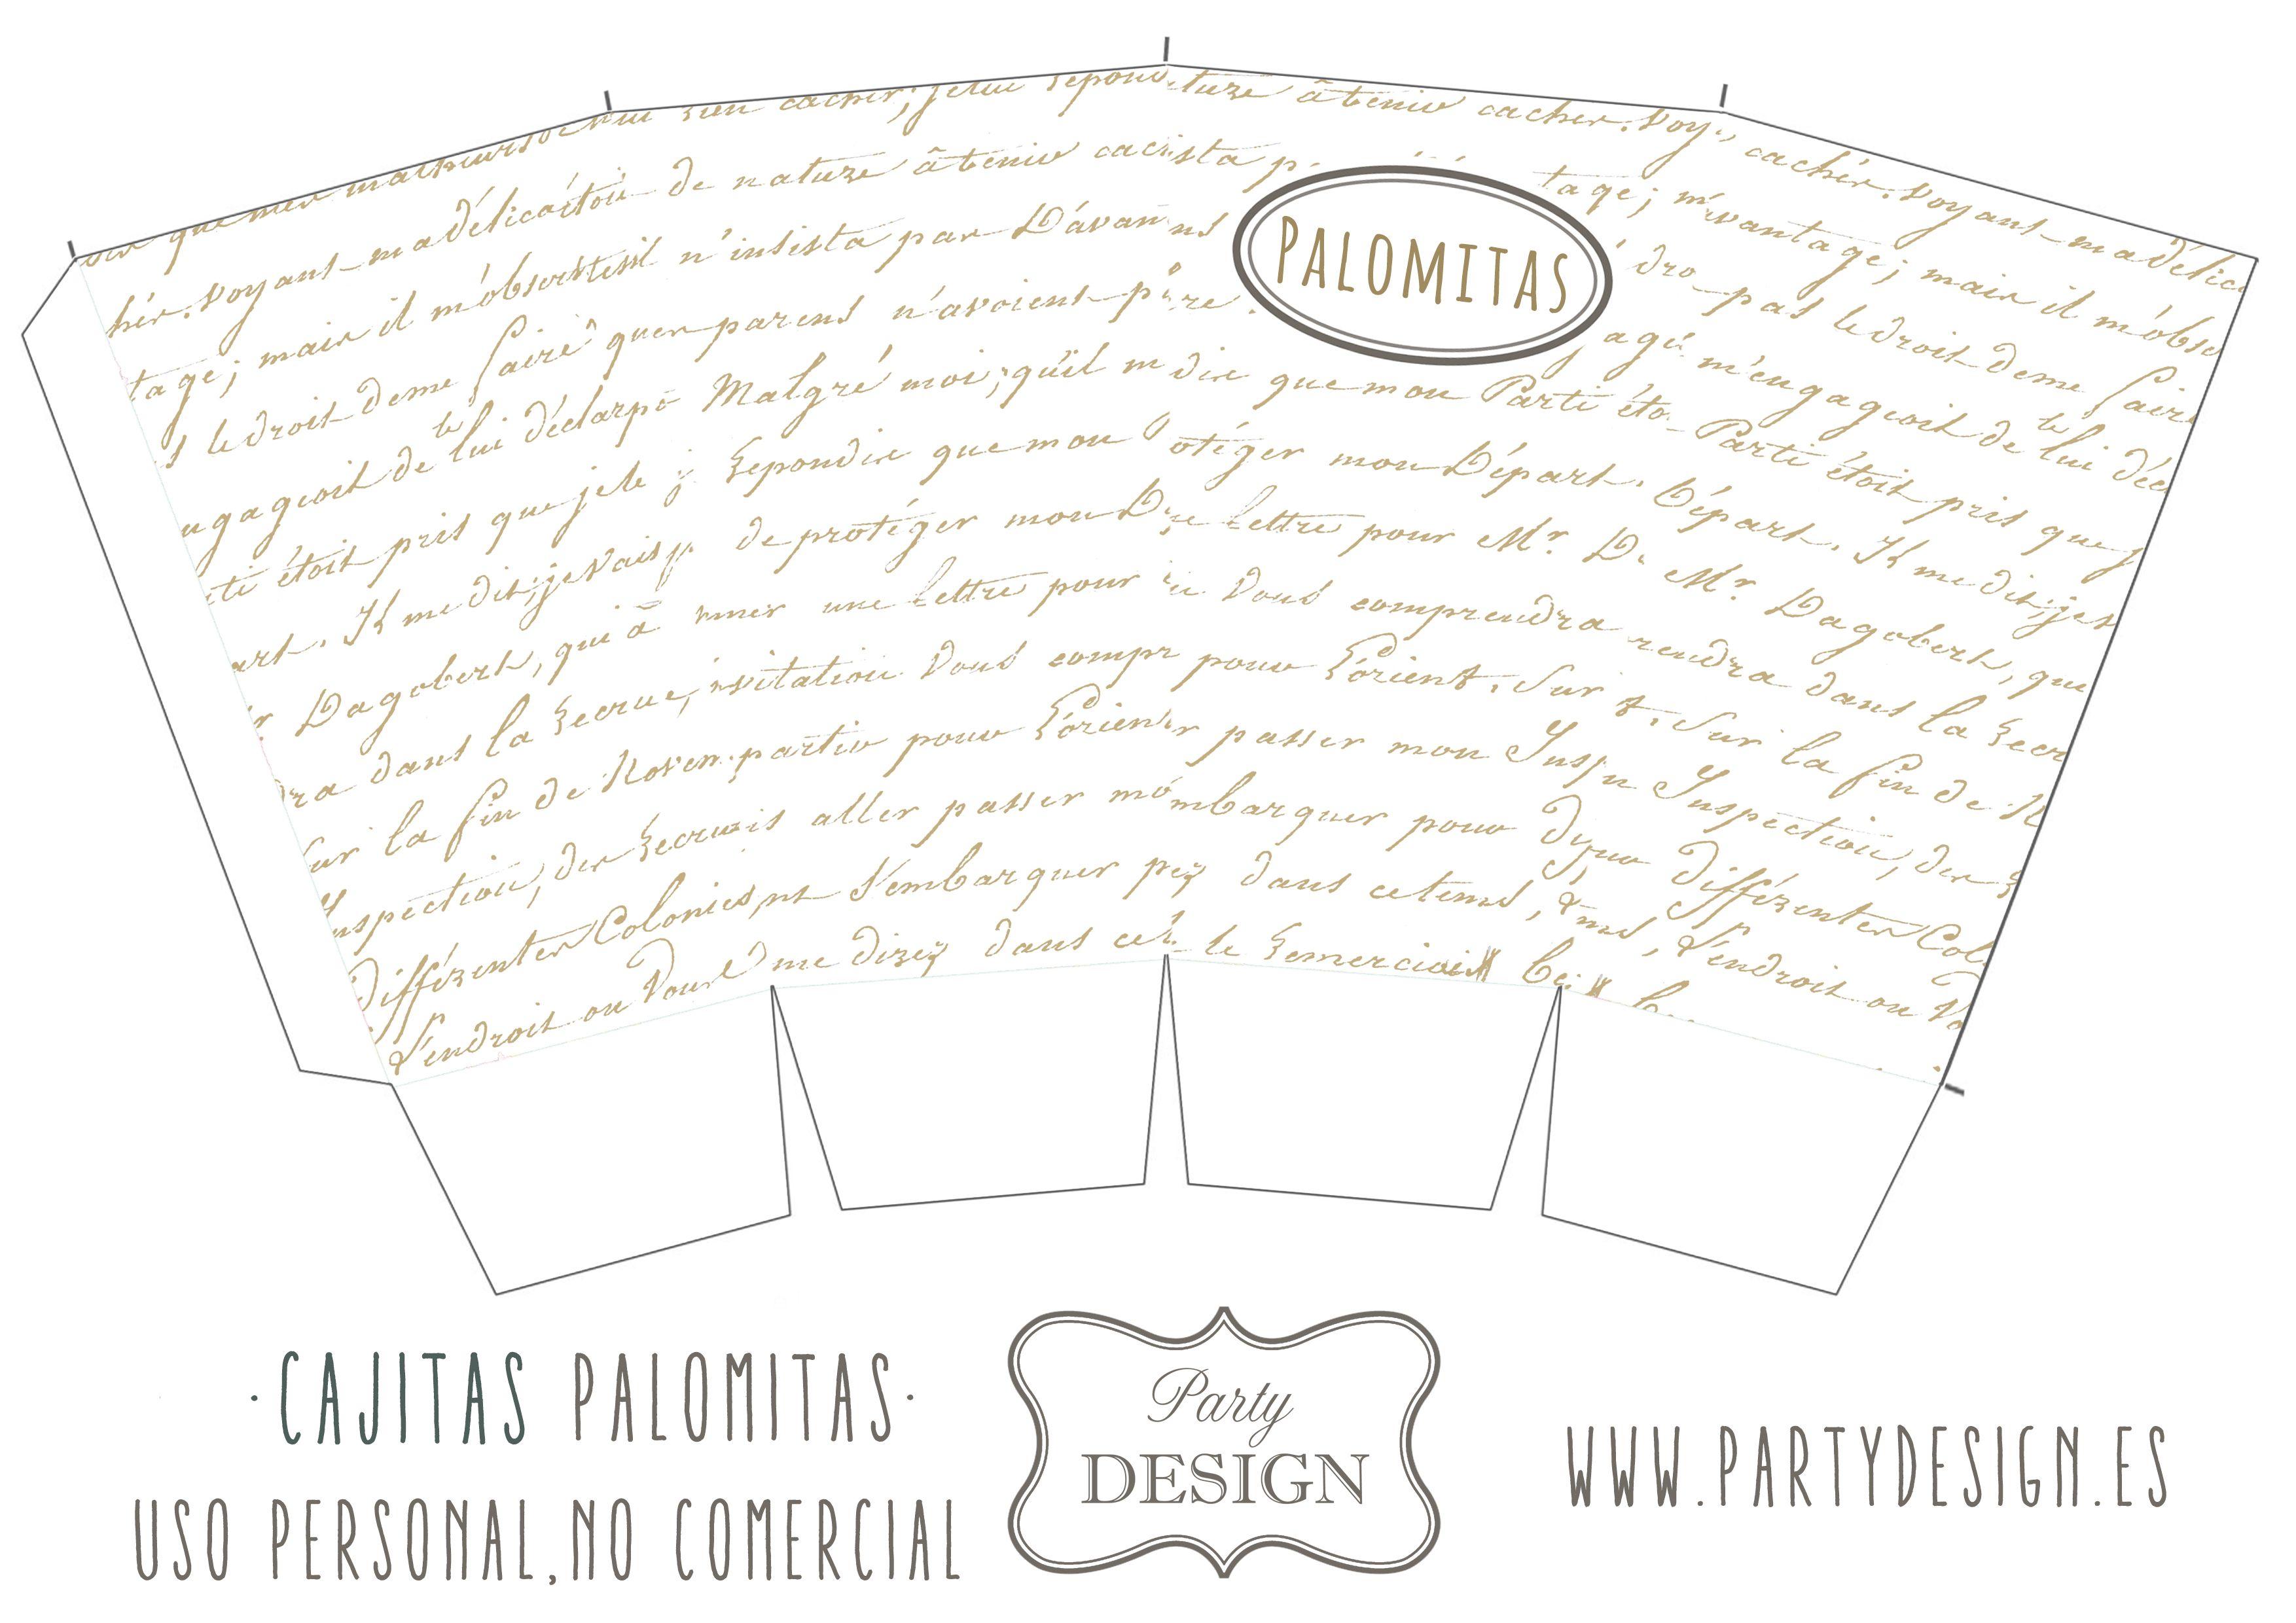 Moldes De Palomas Para Imprimir: Cajitas Para Palomitas Personalizadas